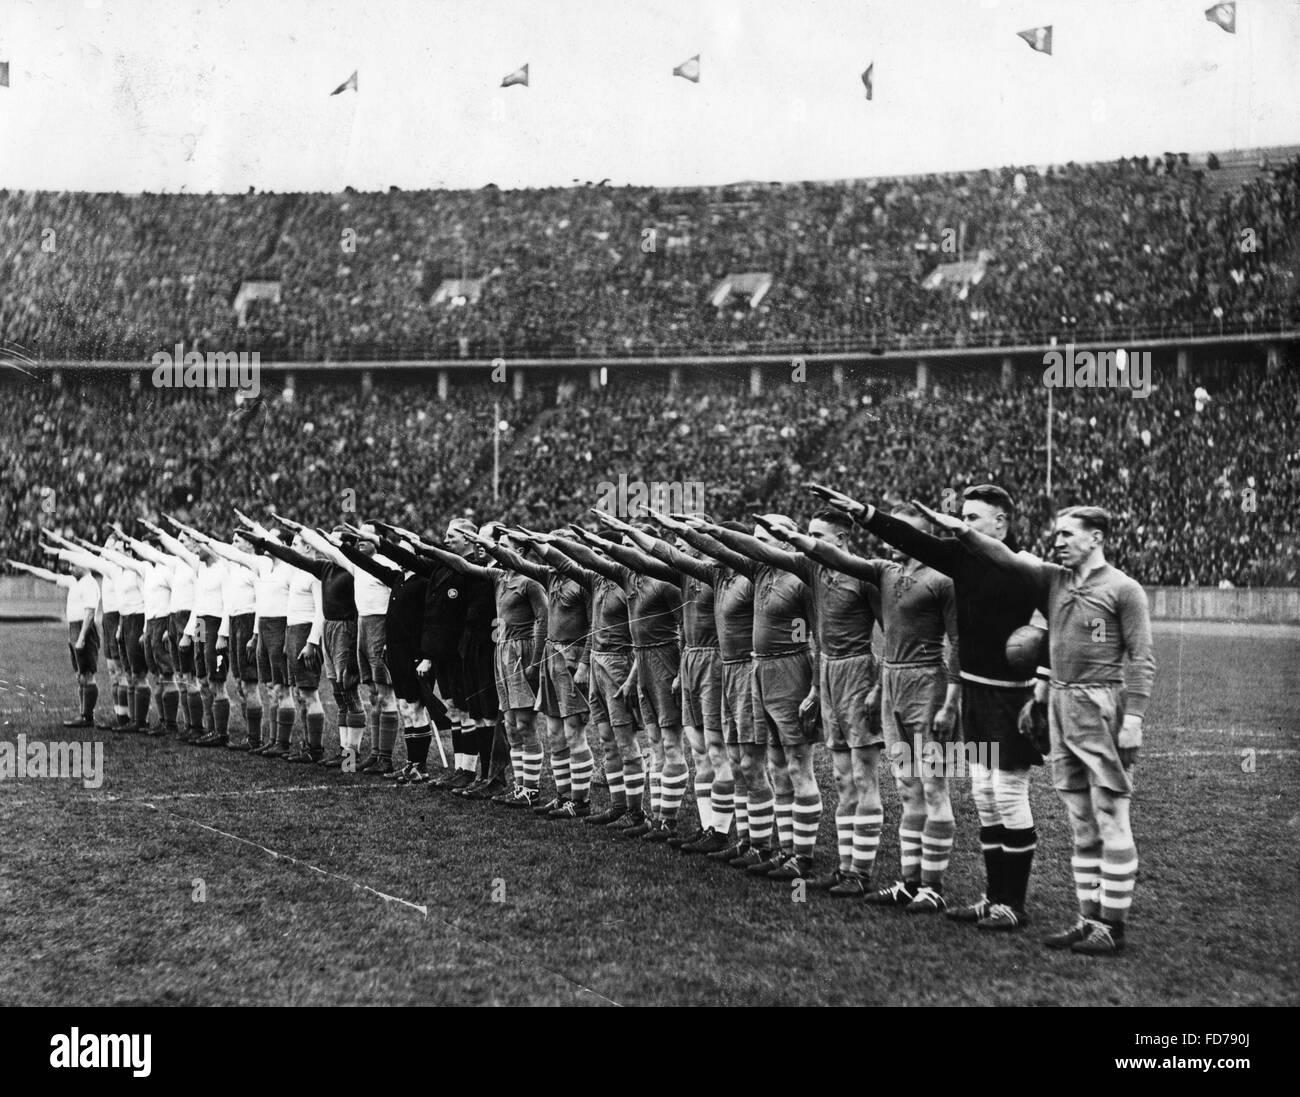 Hertha BSC - Schalke 04 1: 2, Olympiastadion Berlin, April 11, 1937 - Stock Image